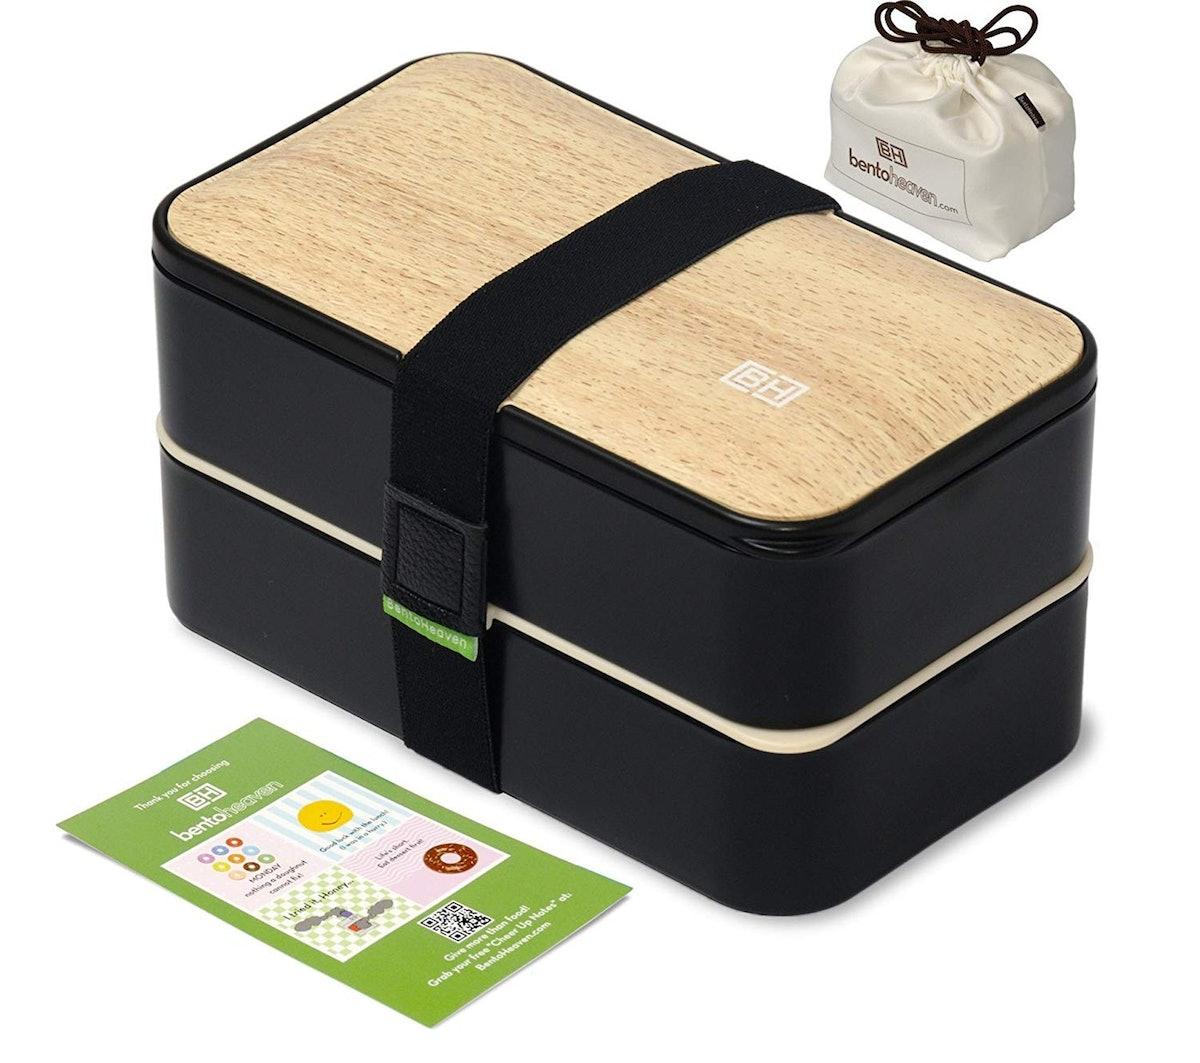 BentoHeaven Bento Box